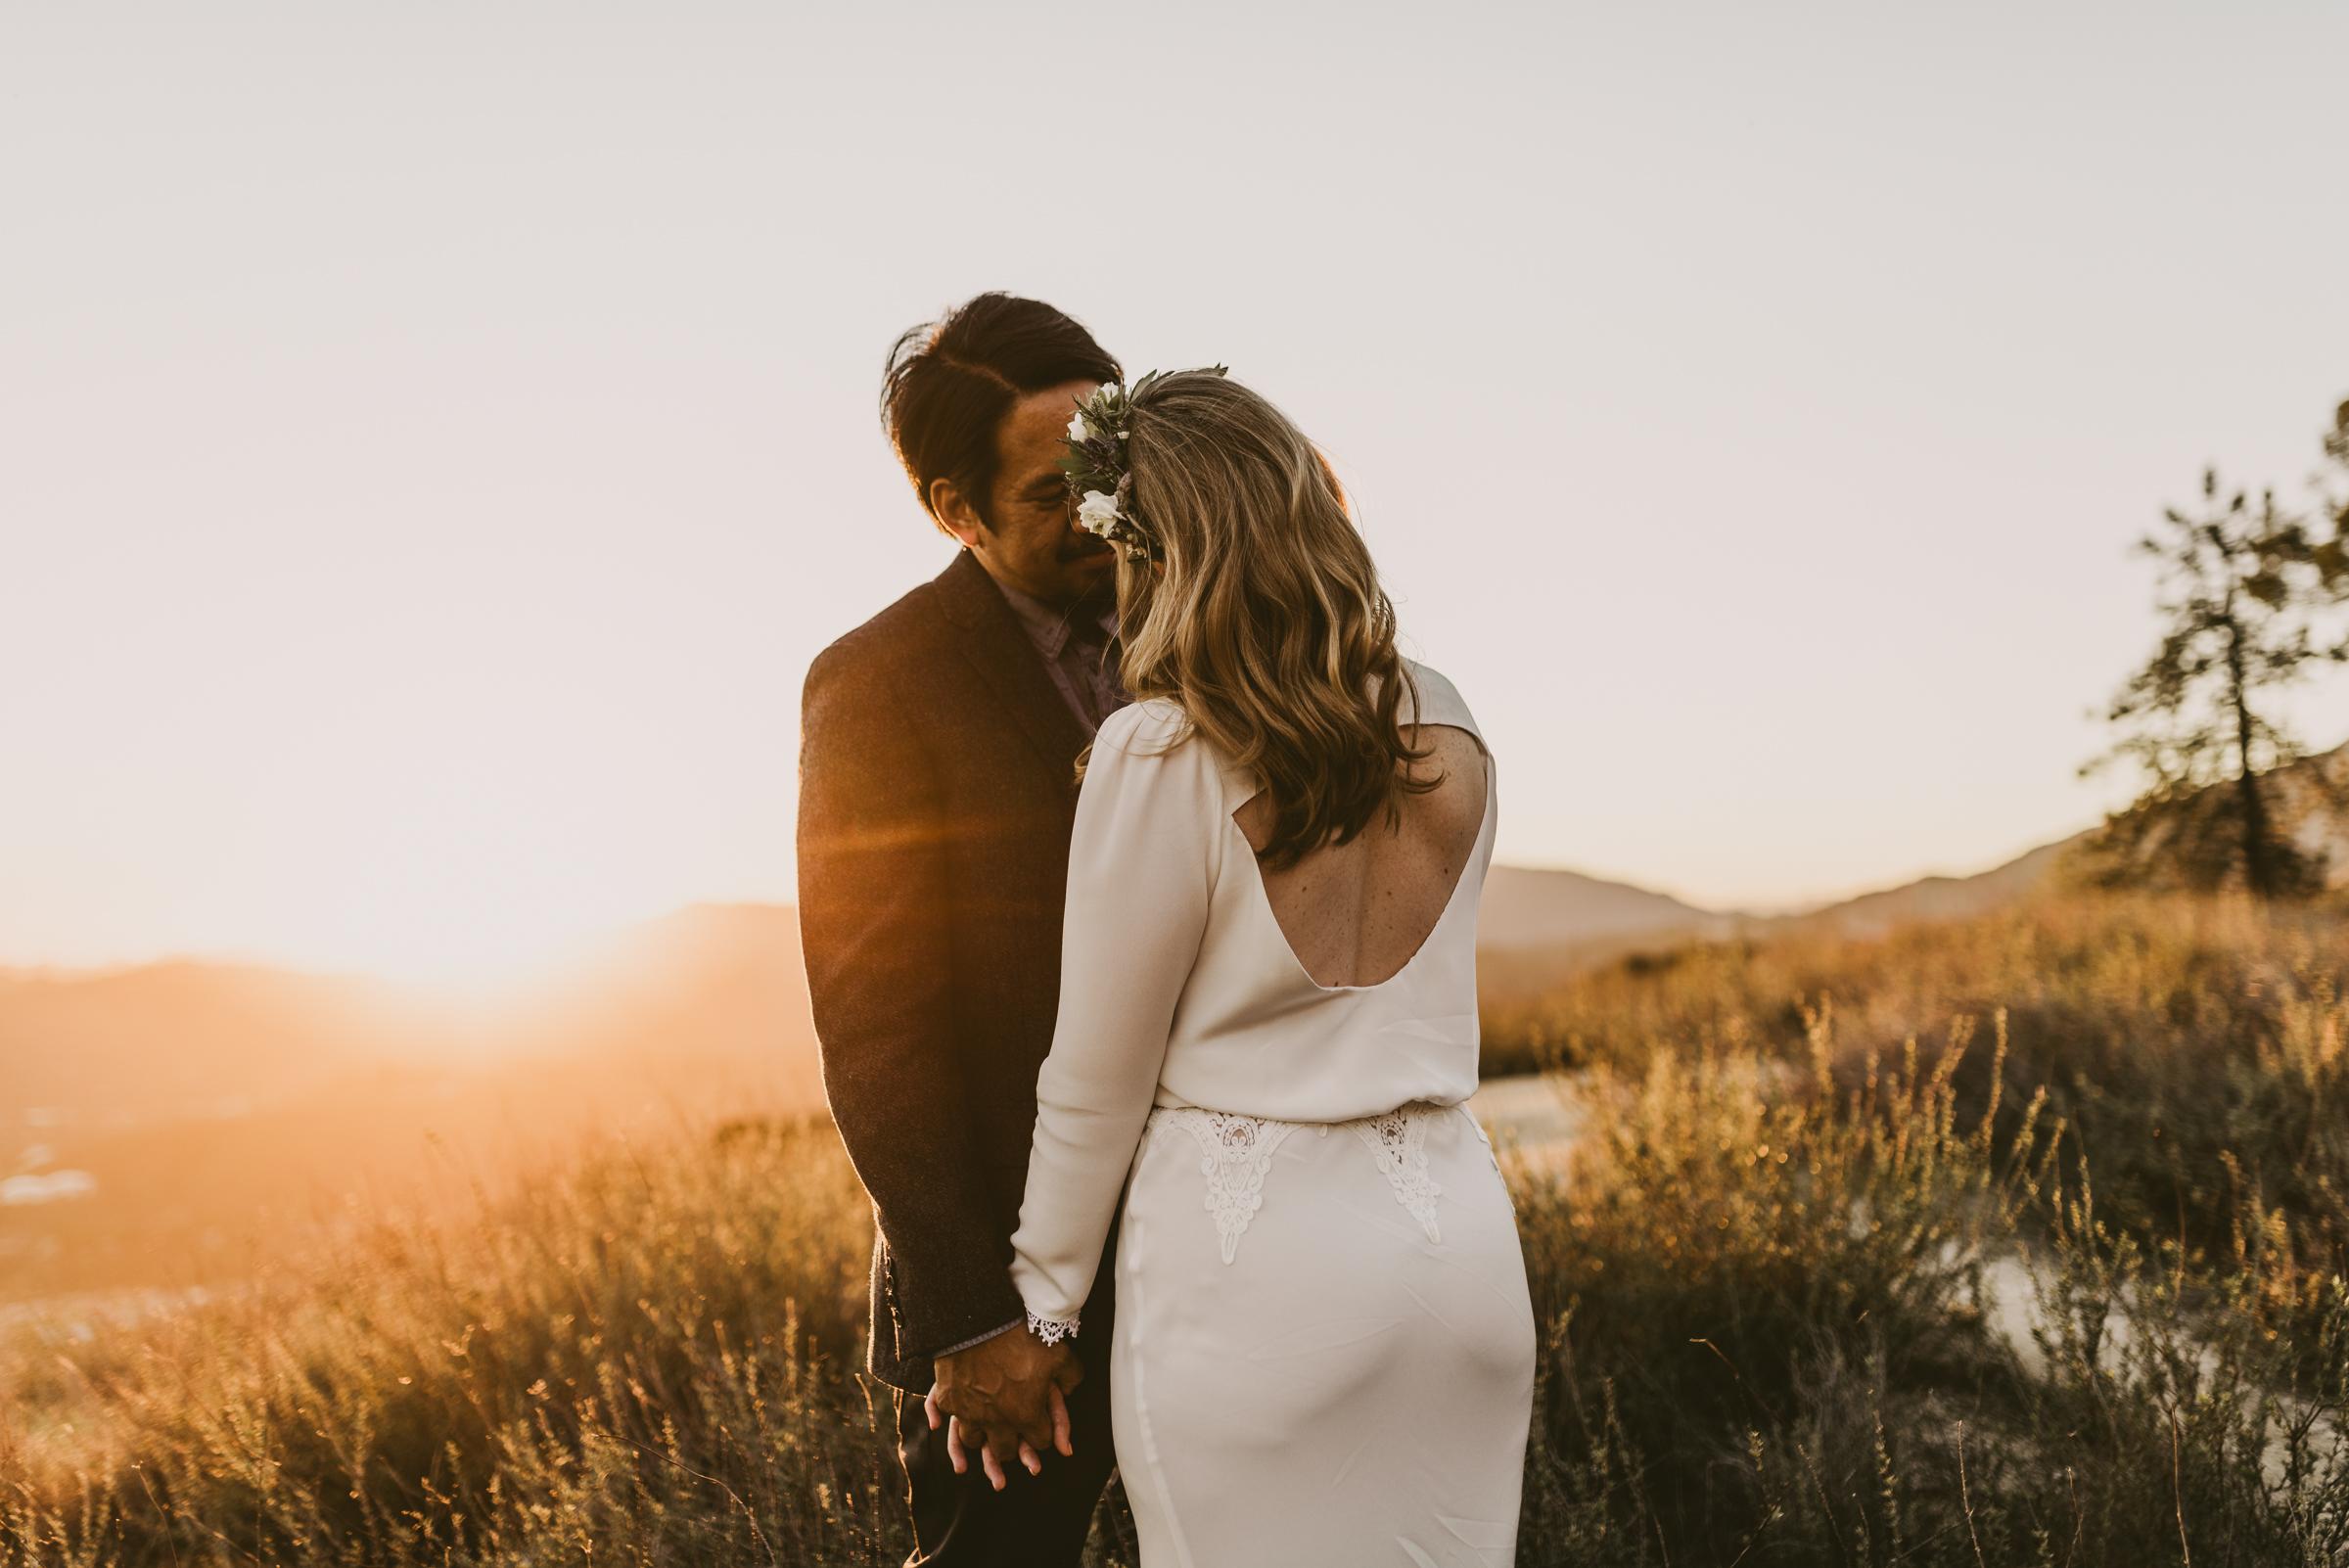 ©Isaiah + Taylor Photography - Intimate Elopement, Eaton Canyon, Los Angeles Wedding Photographer-91.jpg